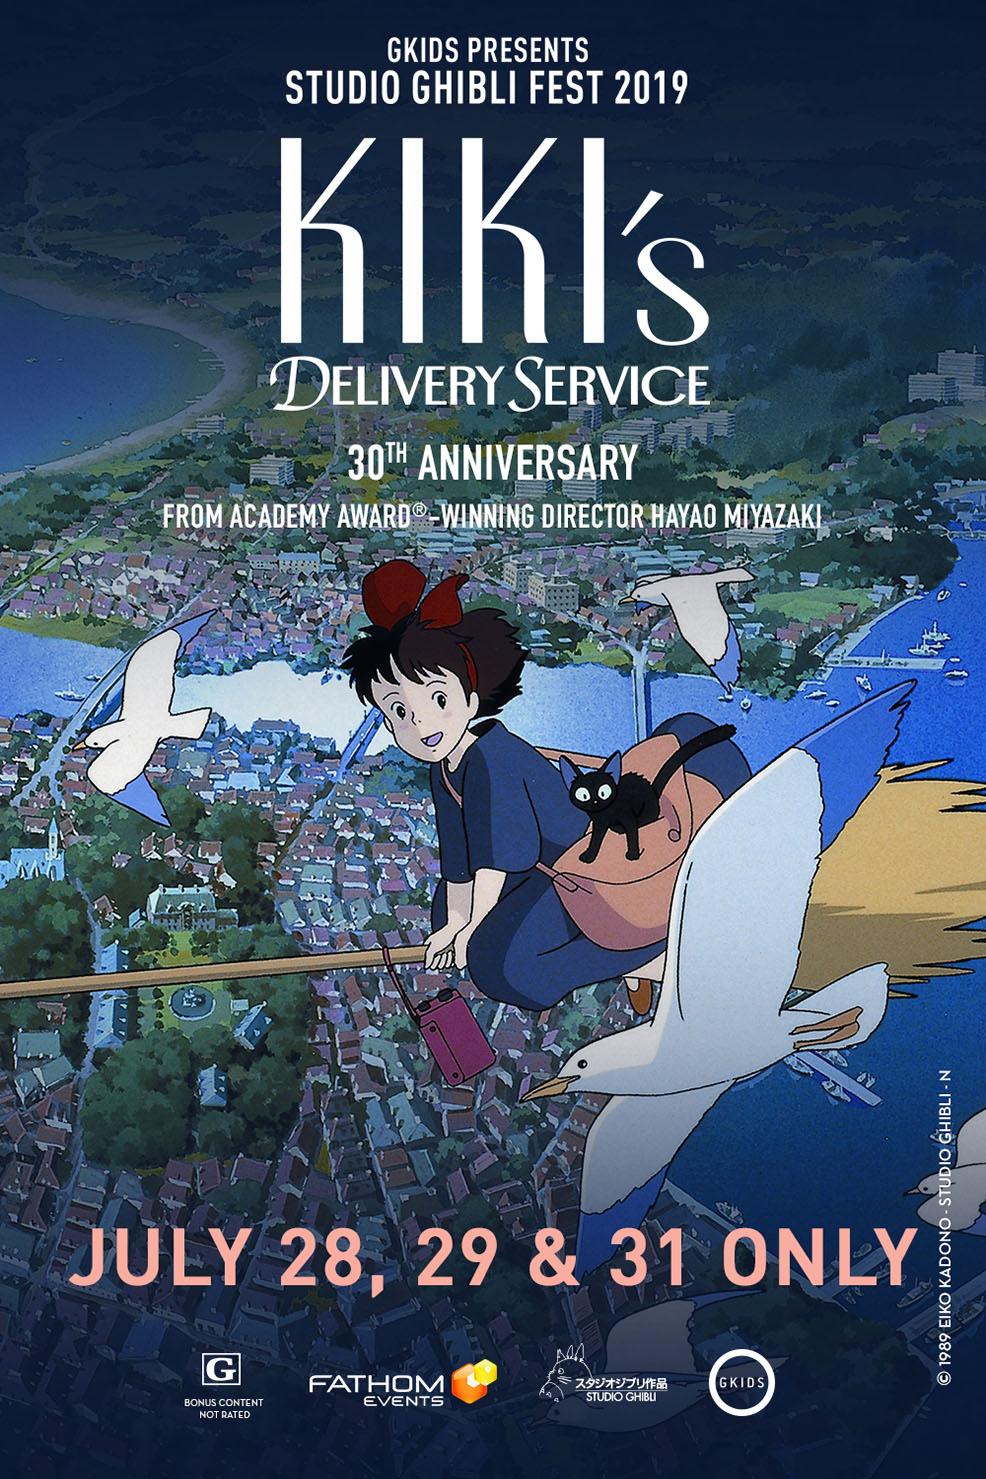 9 Films Showing at Studio Ghibli Fest 2019